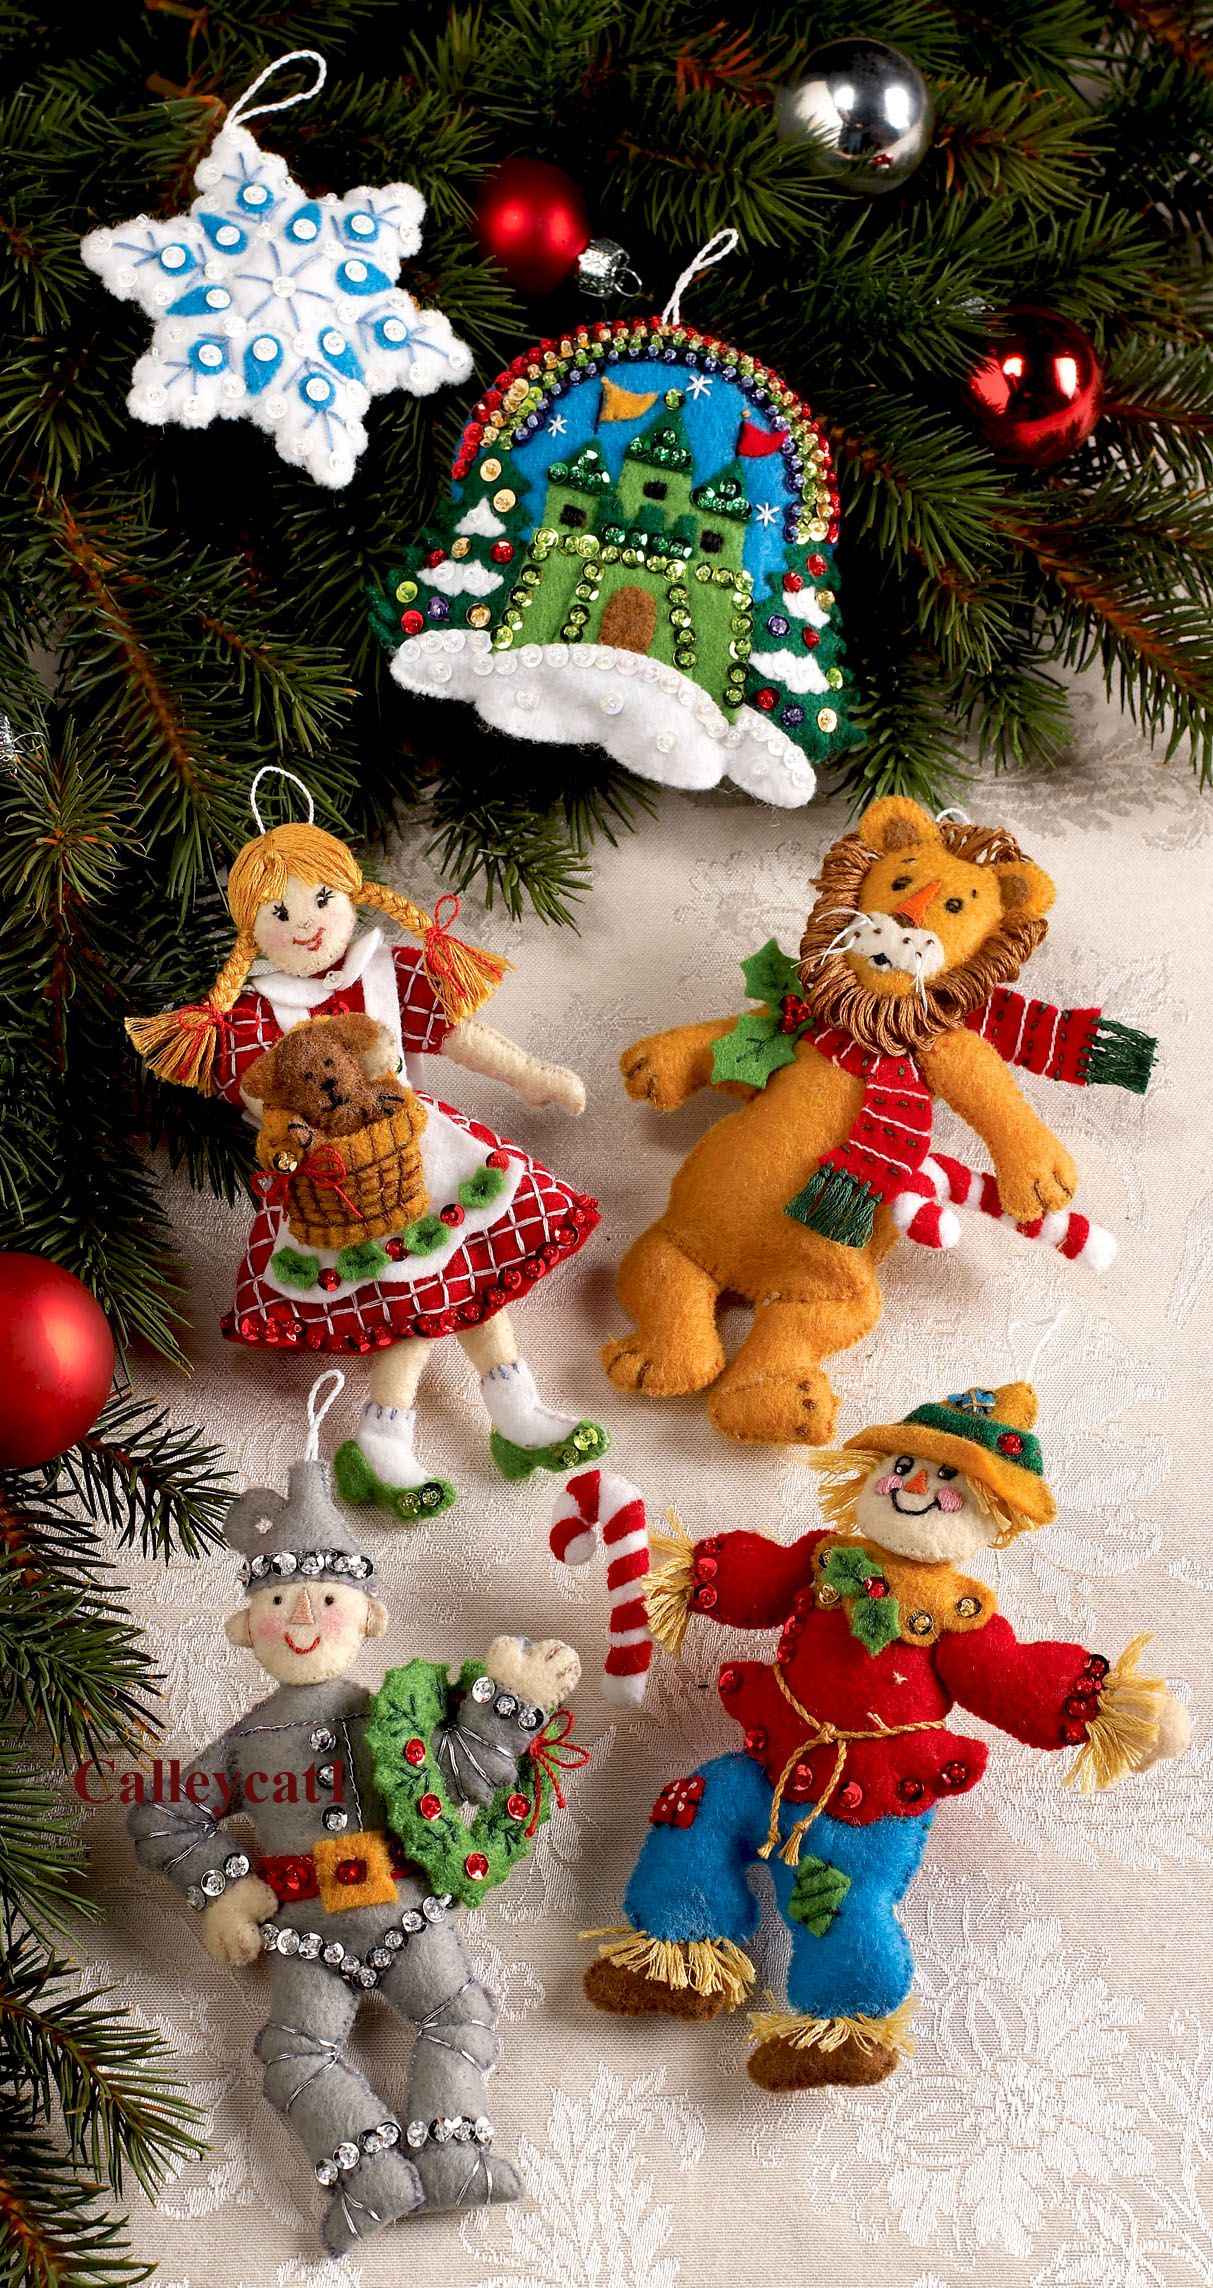 Christmas In Oz Bucilla Felt Ornament Kit 86203 Fth Studio International Felt Christmas Ornaments Christmas Ornament Crafts Felt Ornaments